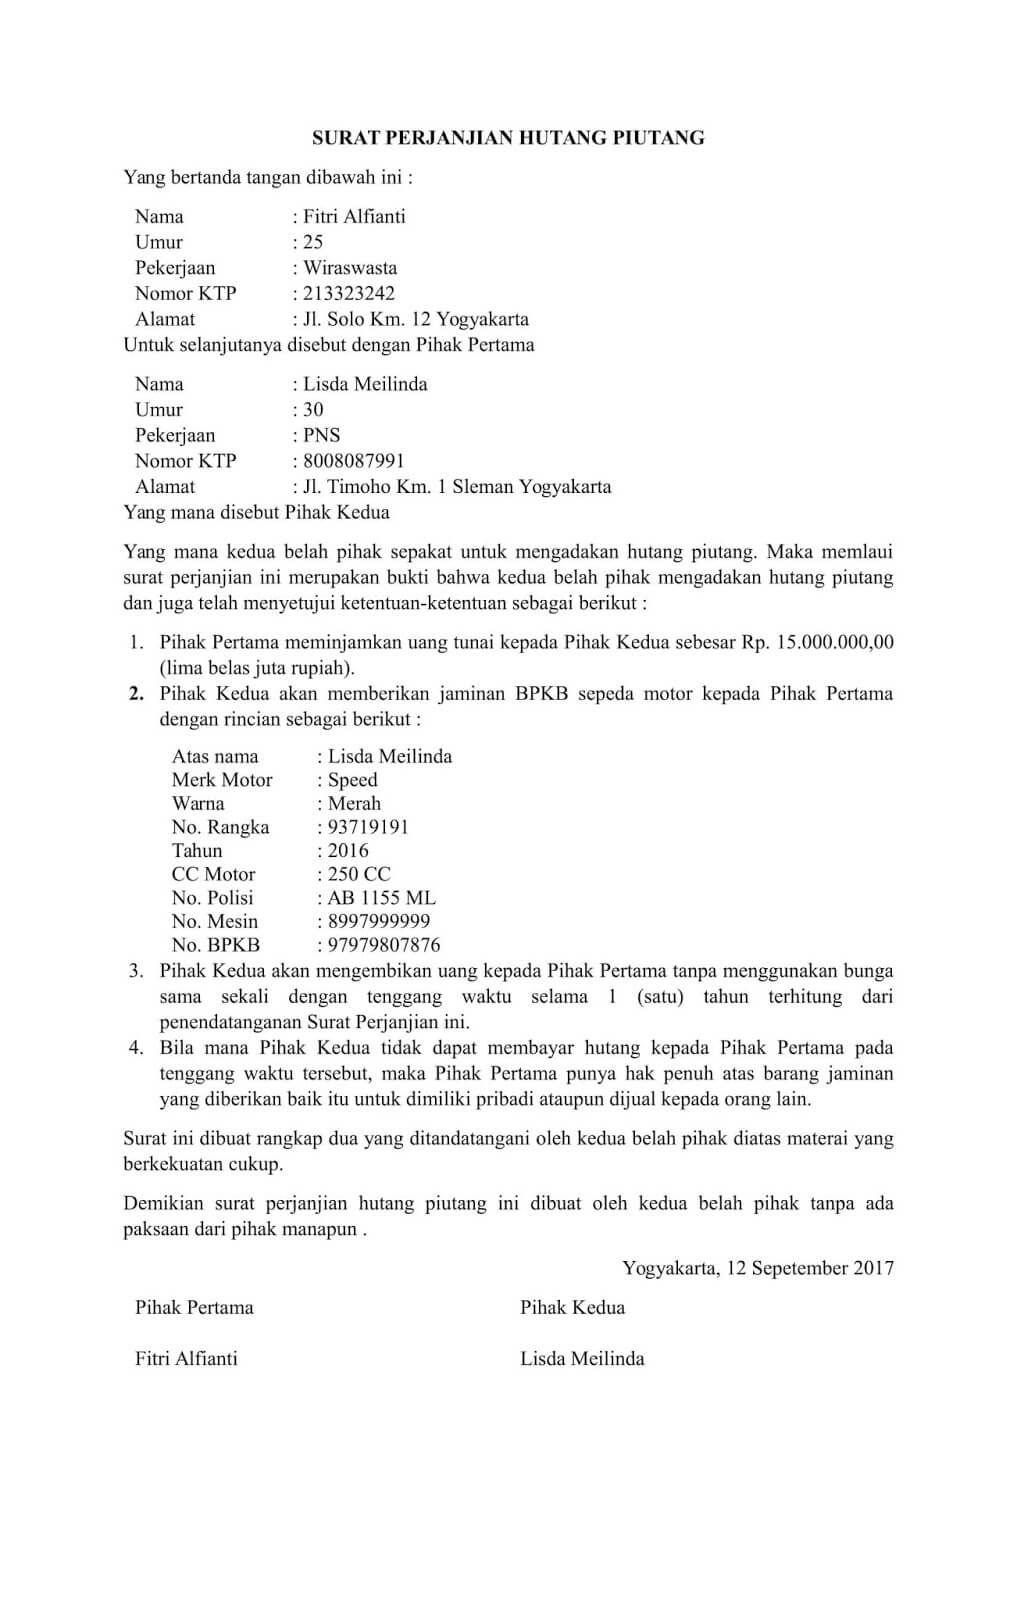 Contoh Surat Perjanjian Hutang Piutang Sederhana Dengan Jaminan Bermaterai Surat Inspirasi Menulis Uang